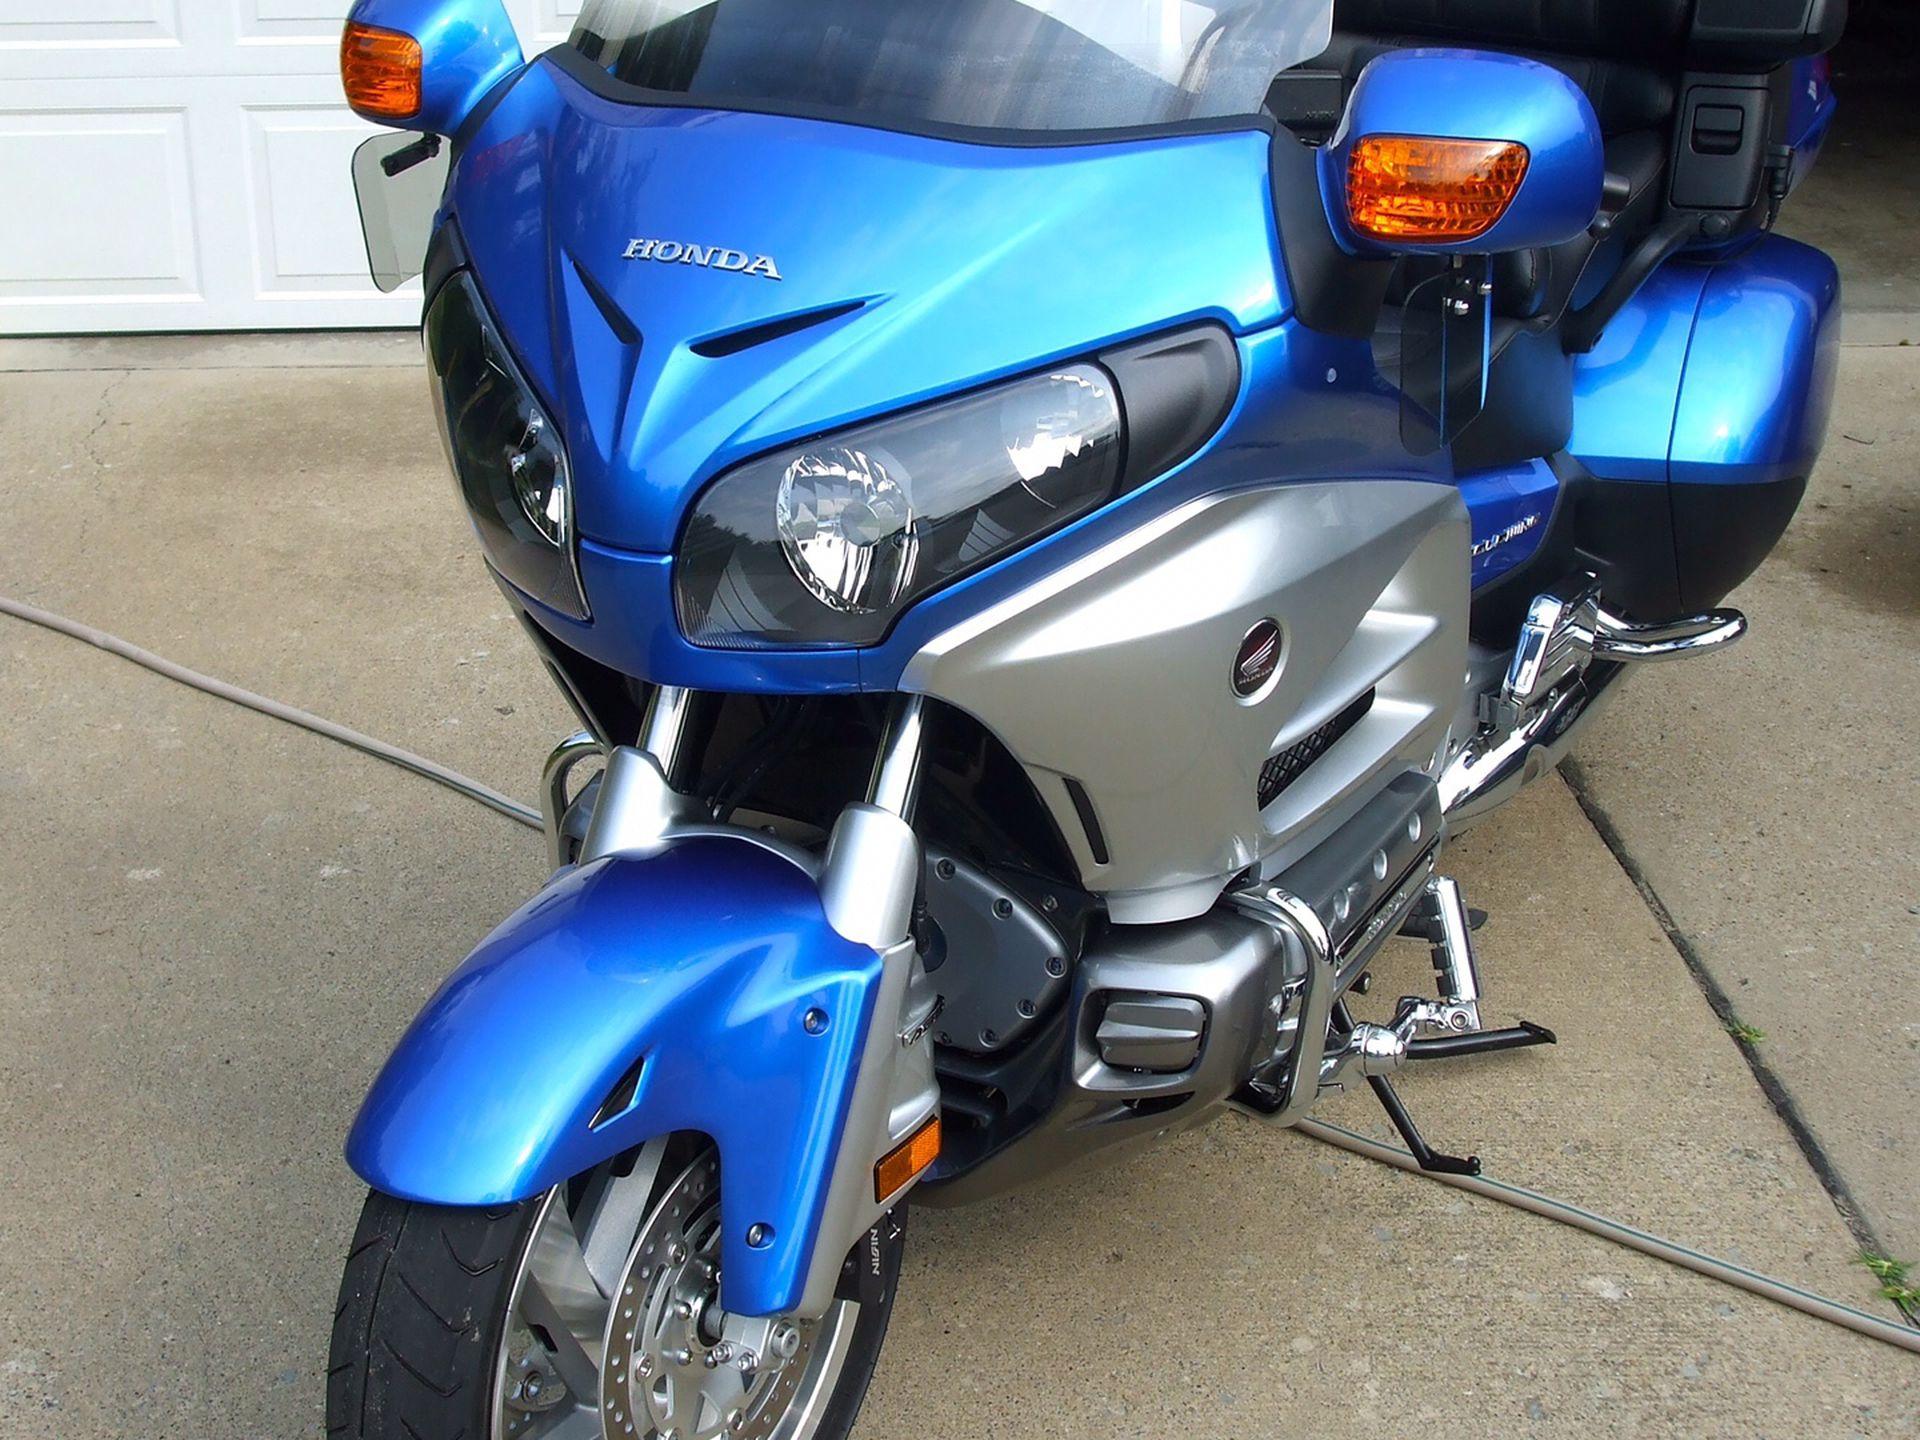 Photo 2012 Honda GL 1800 Goldwing Antilock brakes heated grips and seat XM and satellite GPS